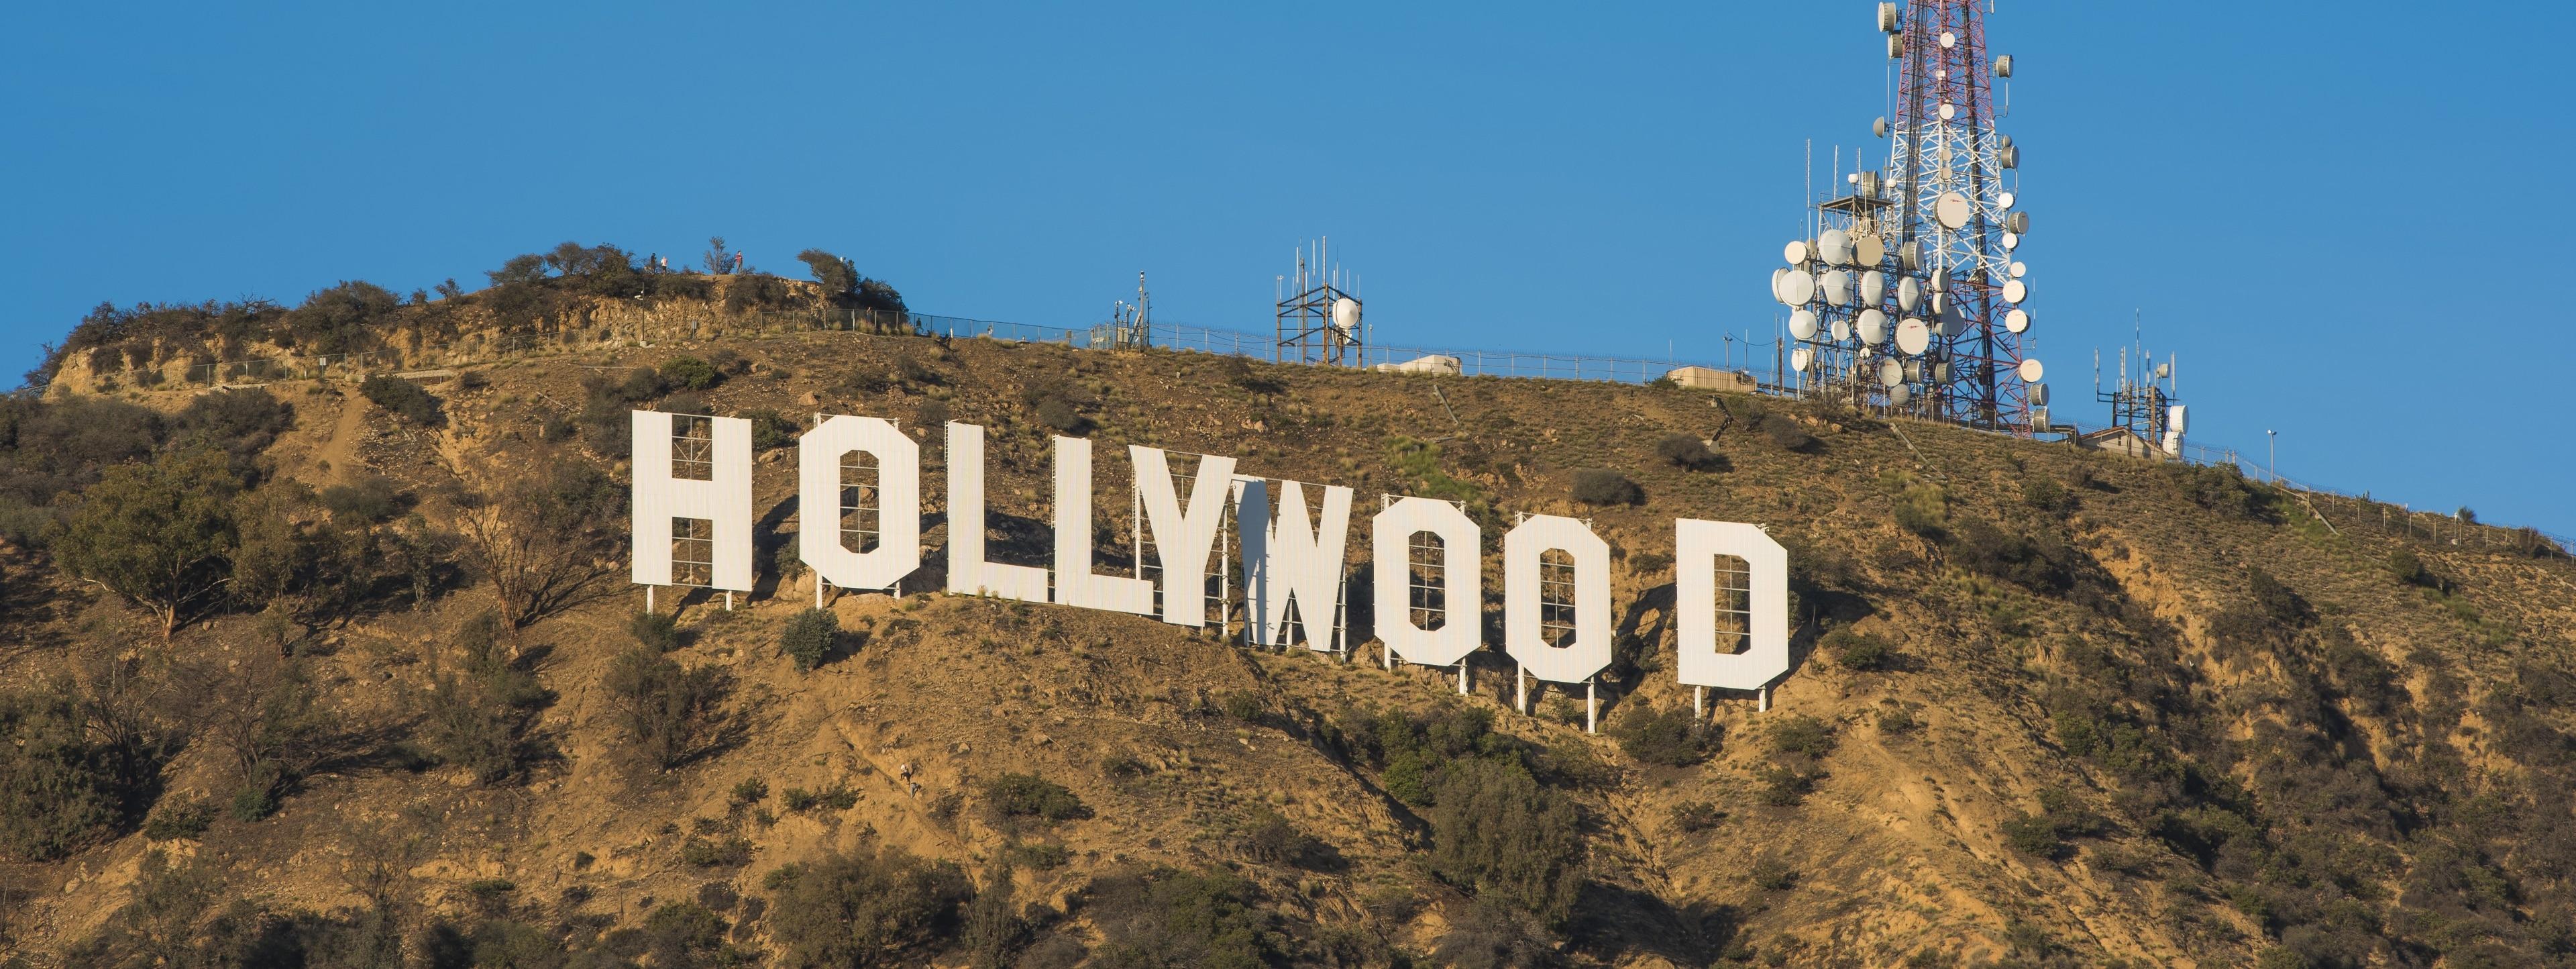 Hollywood Hills, Los Angeles, Kalifornien, USA